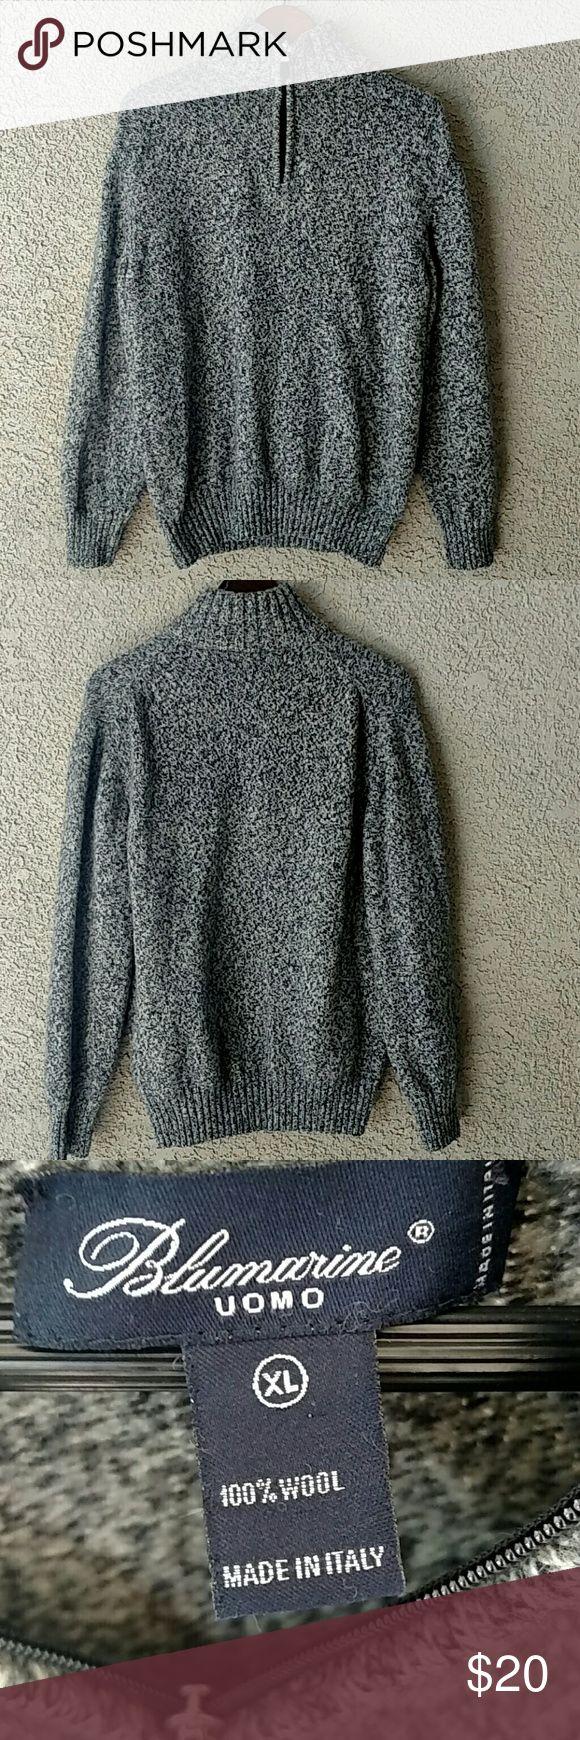 Men's Wool Half Zip Sweater by Blumarine Uomo A 100% wool men's half zip sweater by Blumarine Uomo. Made in Italy this sweater is in EXCELLENT CONDITION! Blumarine Sweaters